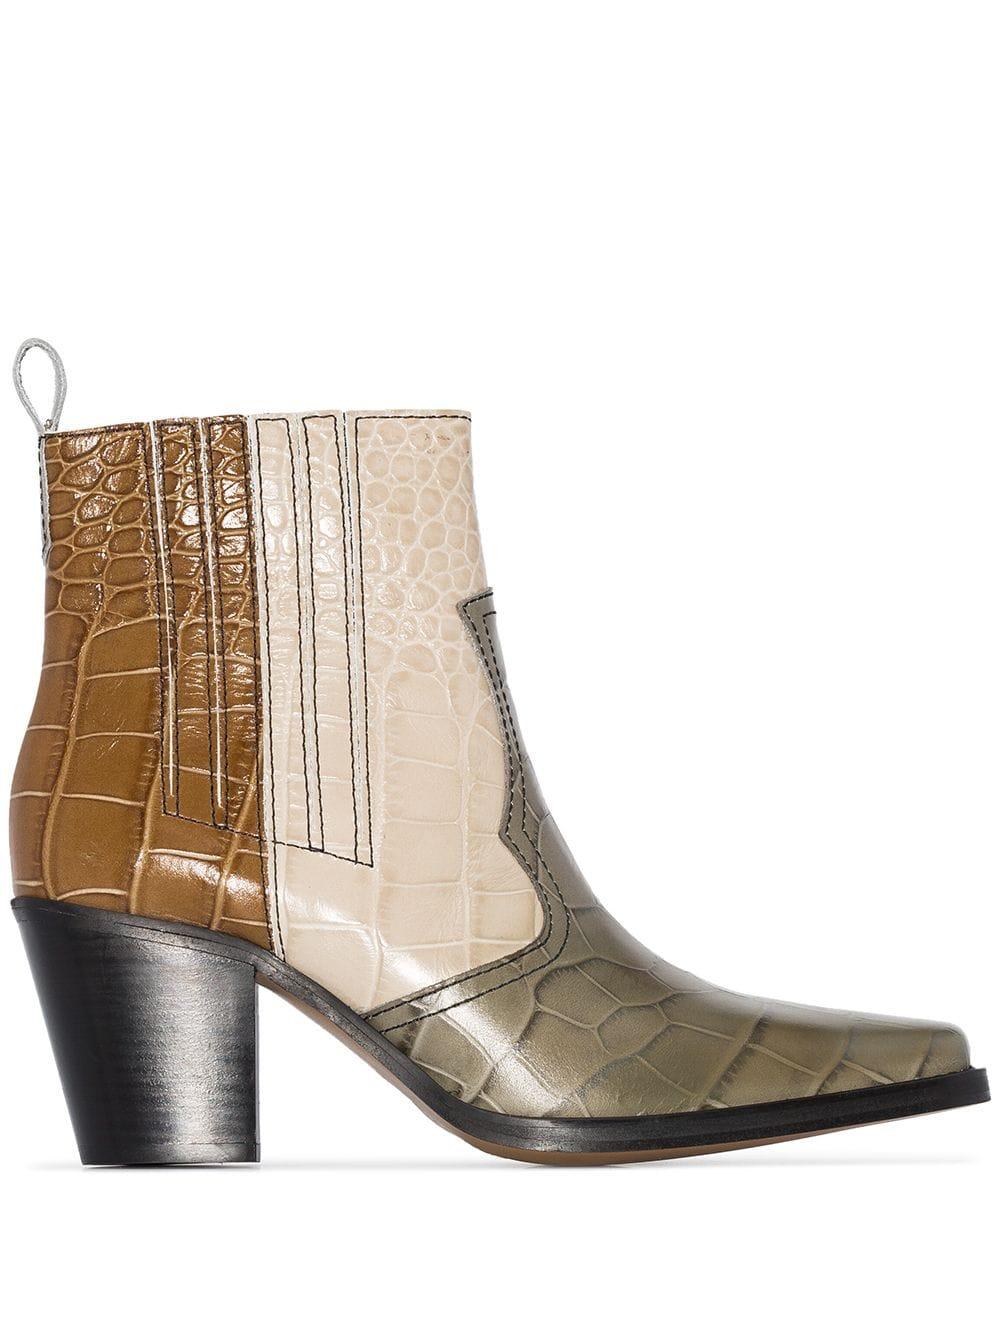 huge discount 1eada f77a6 Ganni Callie 70mm cowboy boots - Multicoloured in 2019 ...